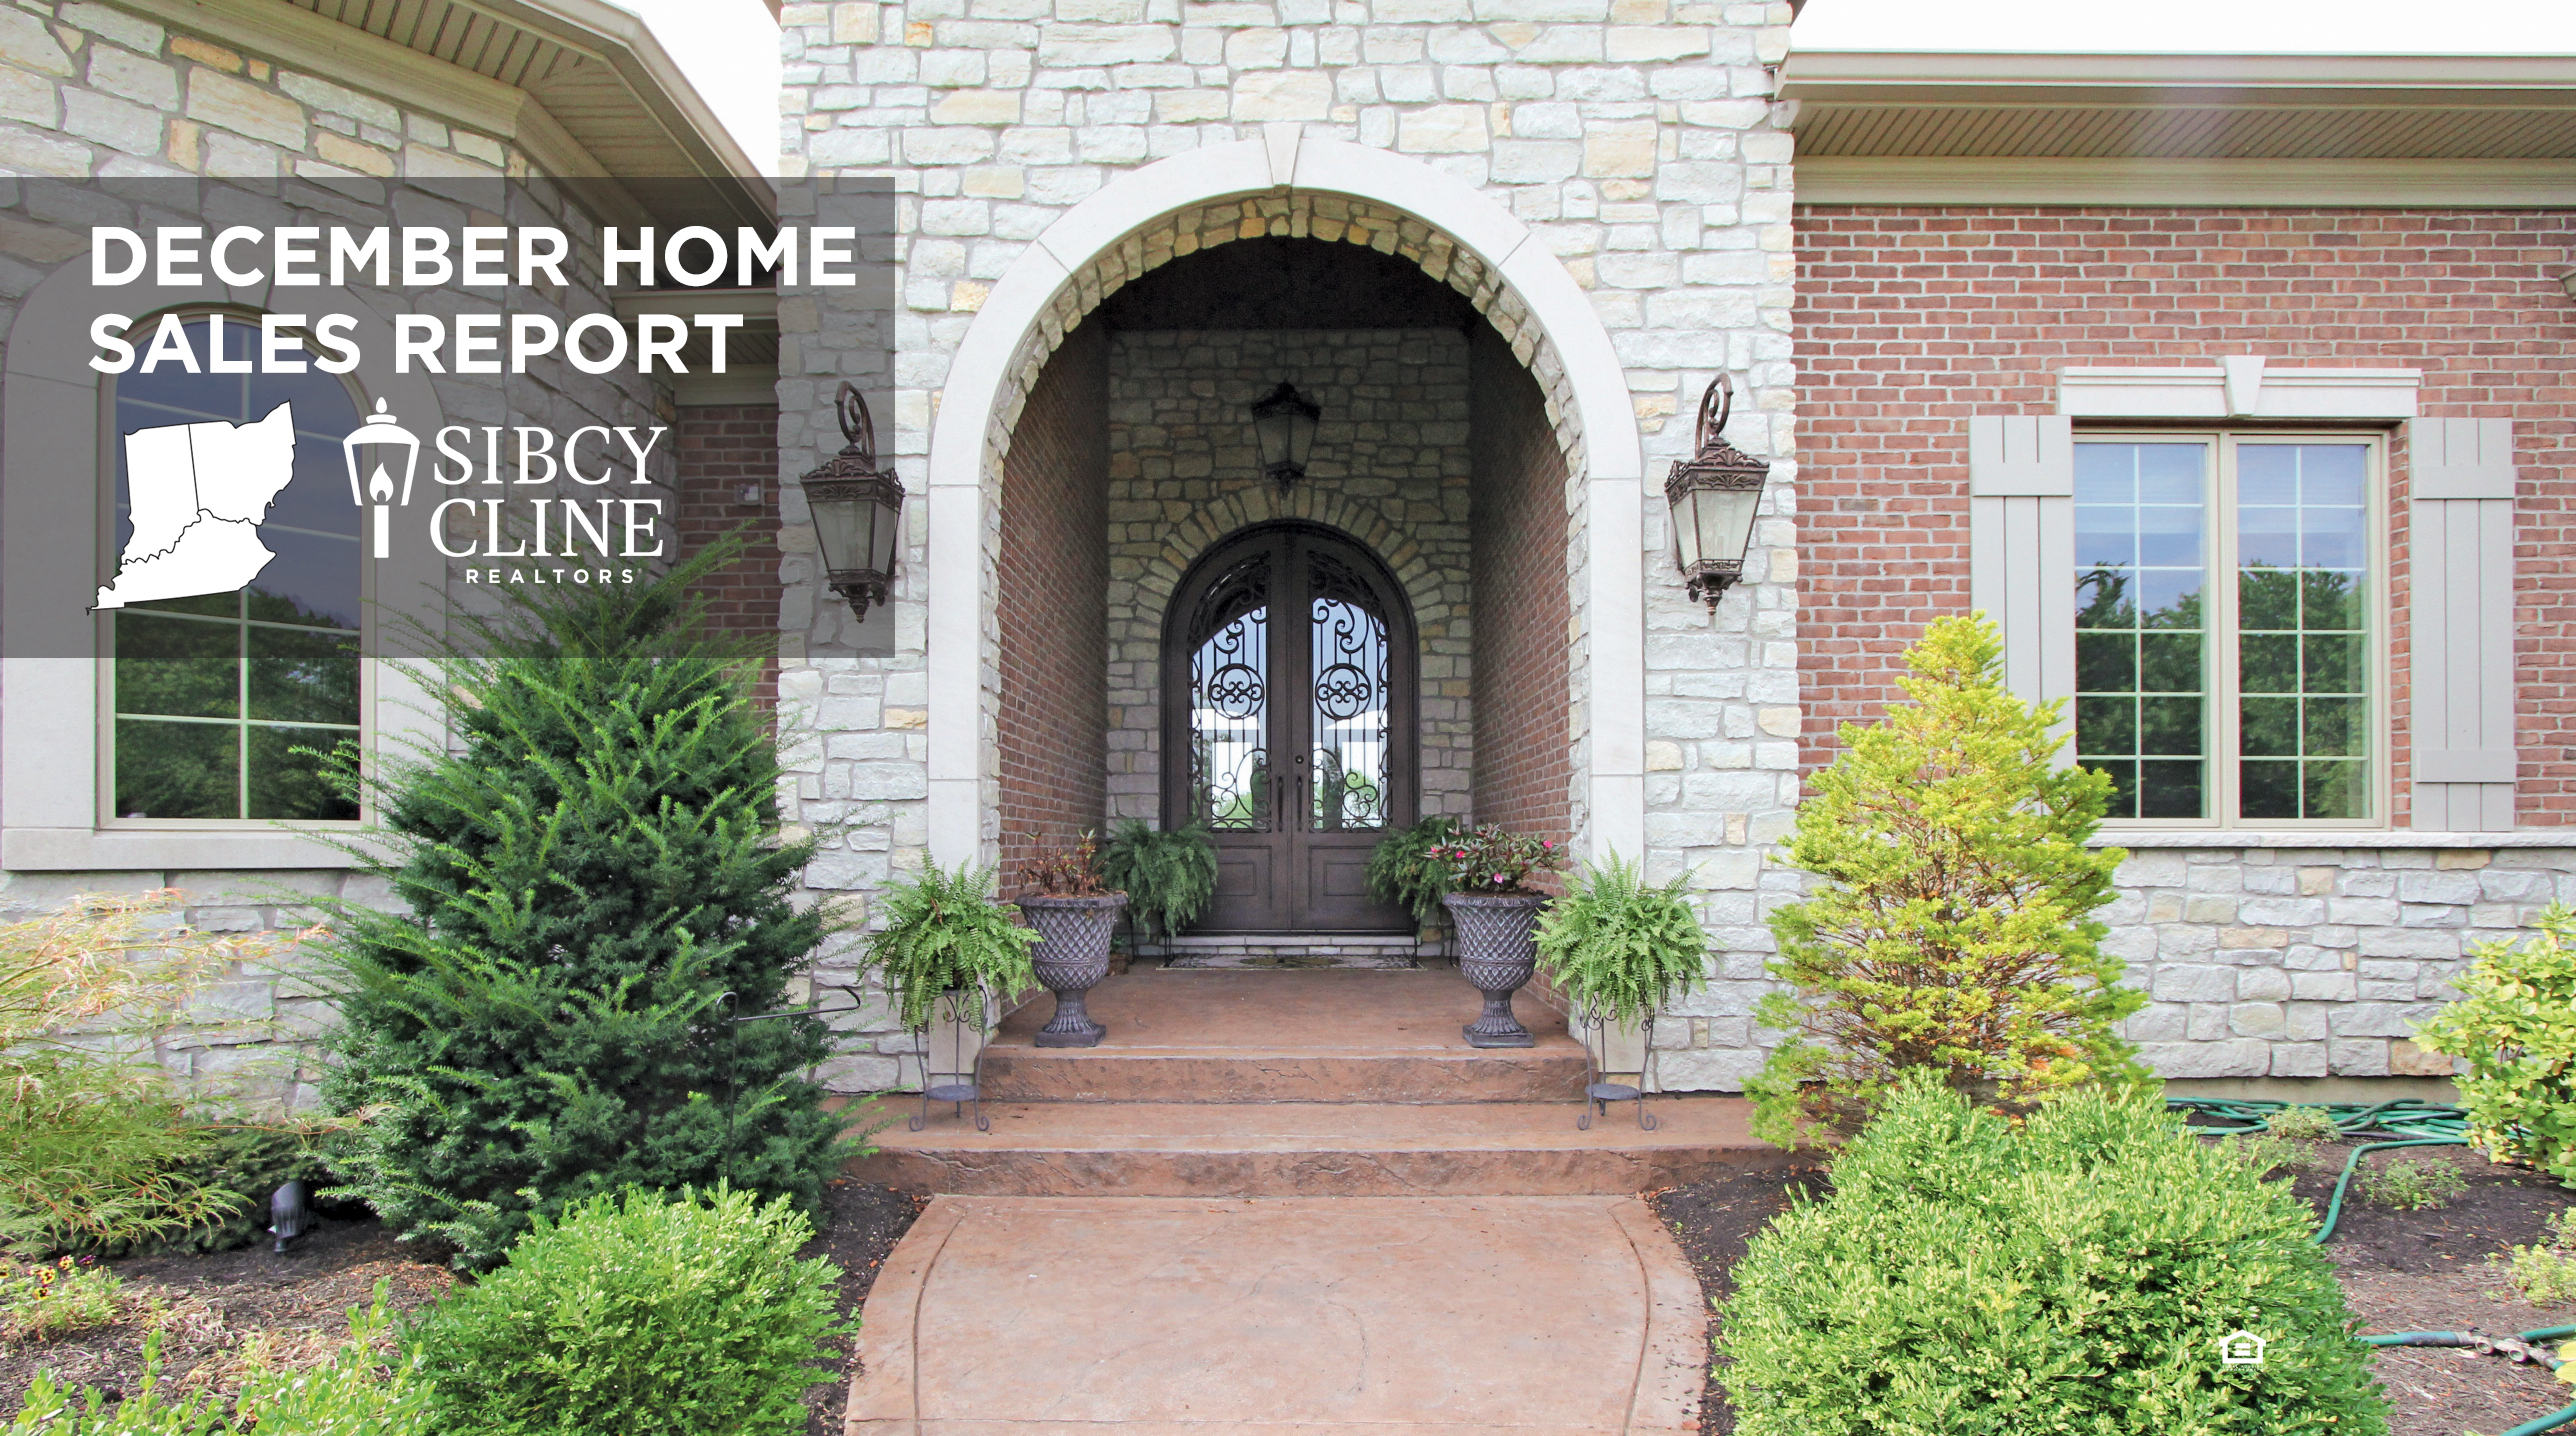 December home sales